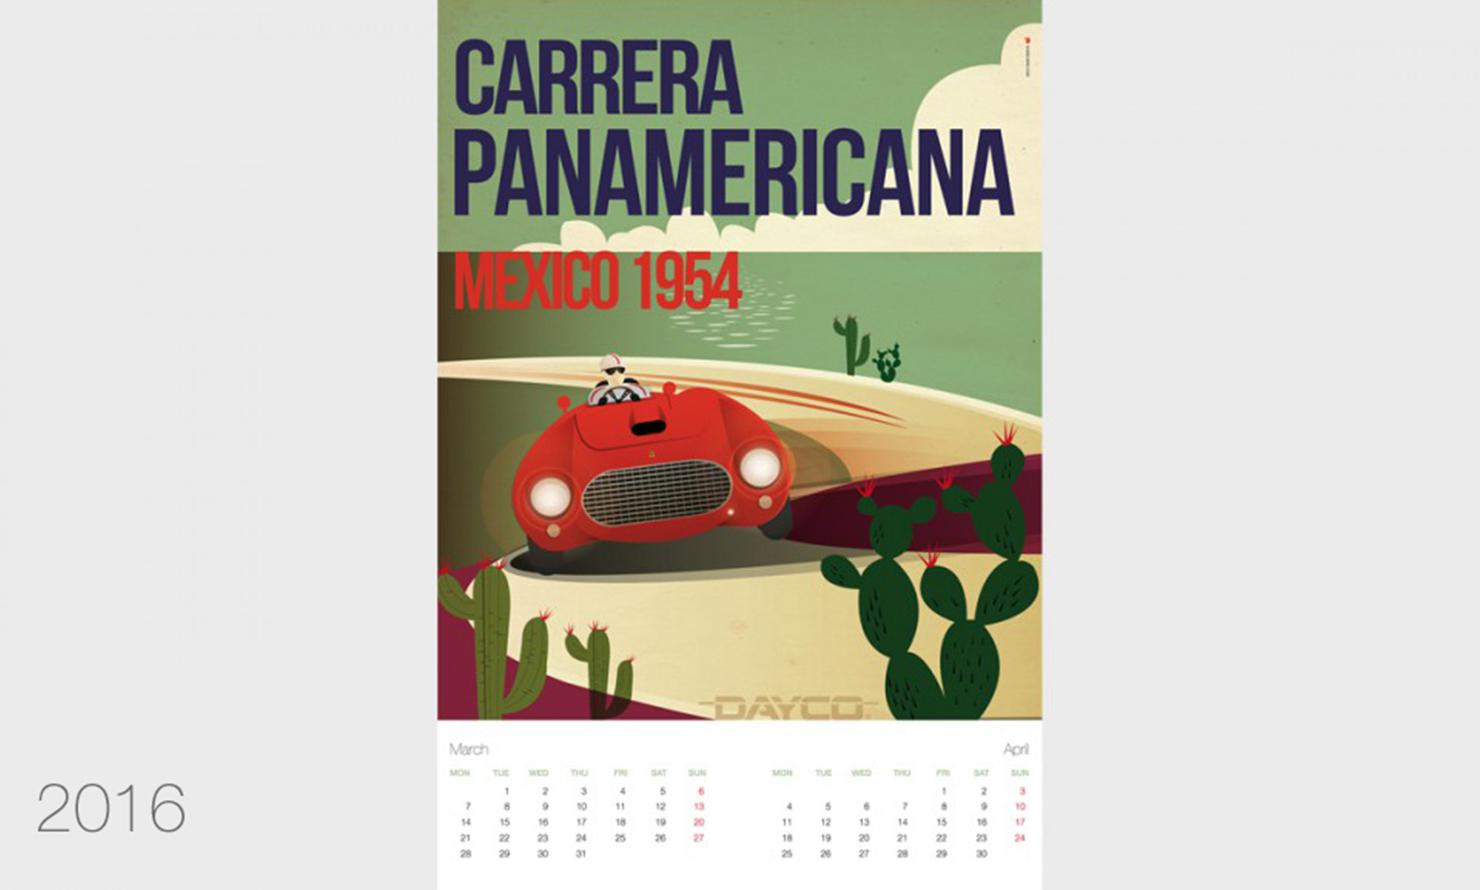 https://www.kubelibre.com/uploads/Slider-work-tutti-clienti/dayco-calendario-2016-2.jpg